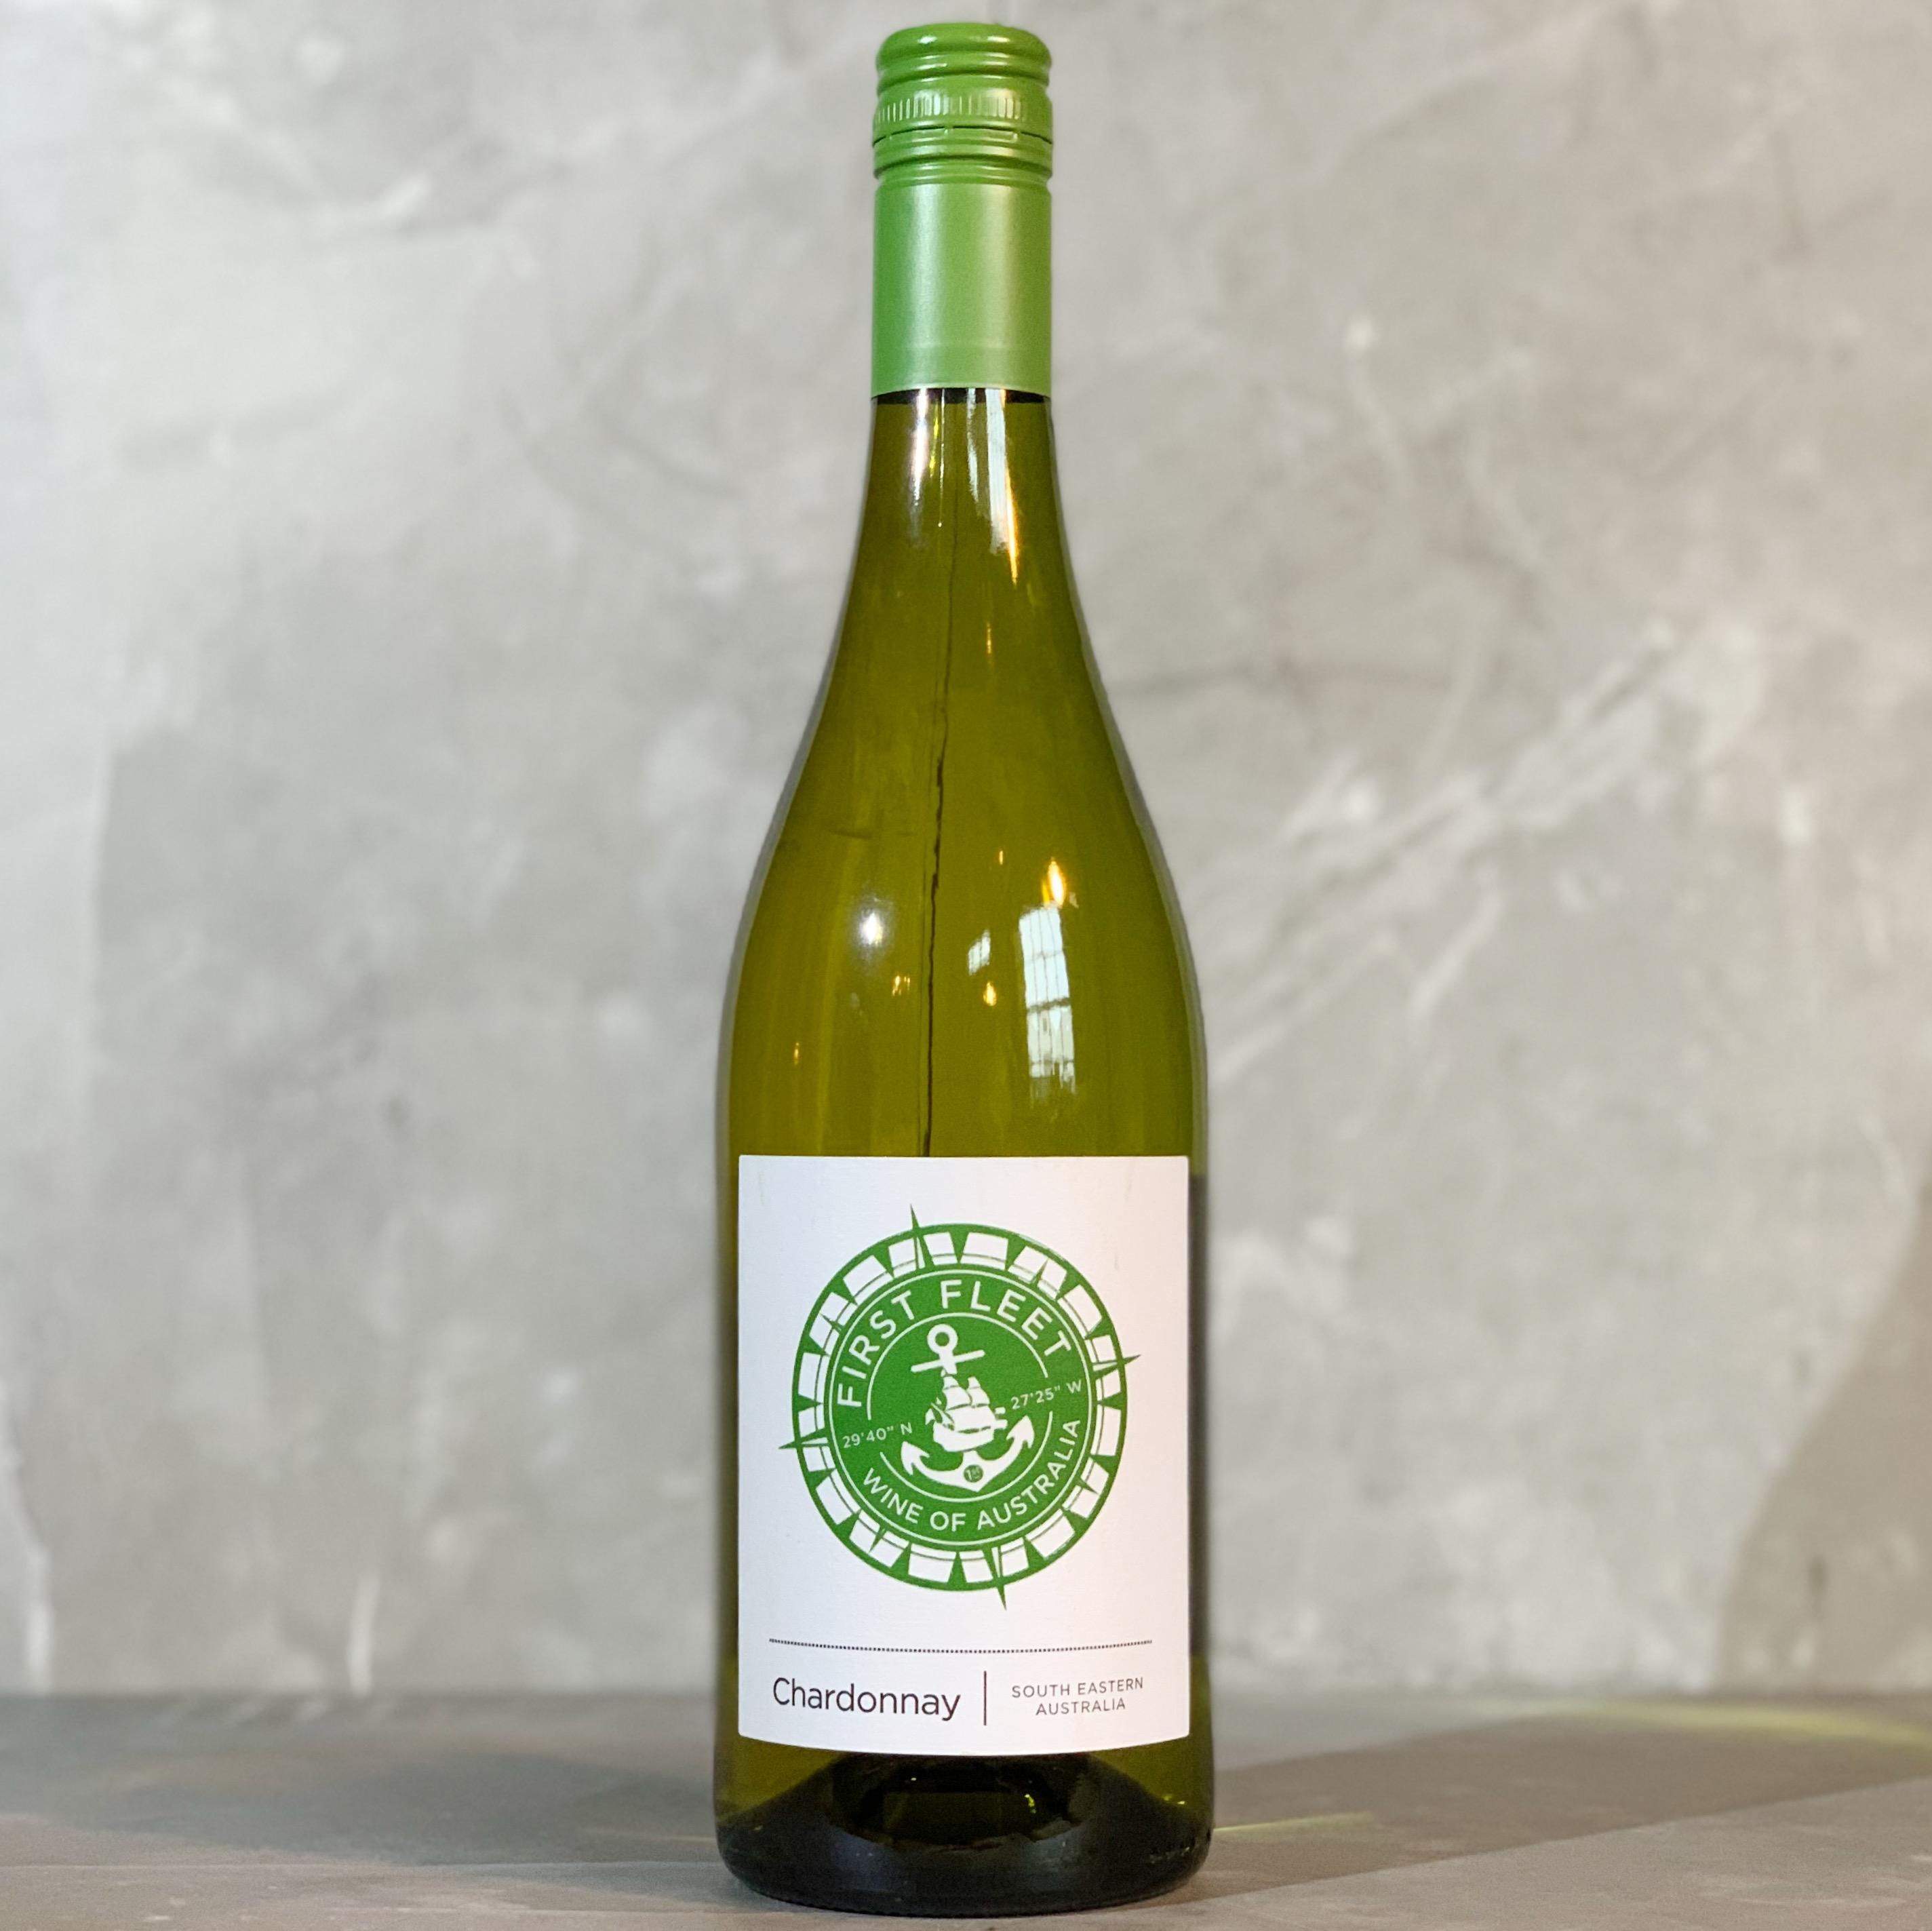 First Fleet Chardonnay - Australia